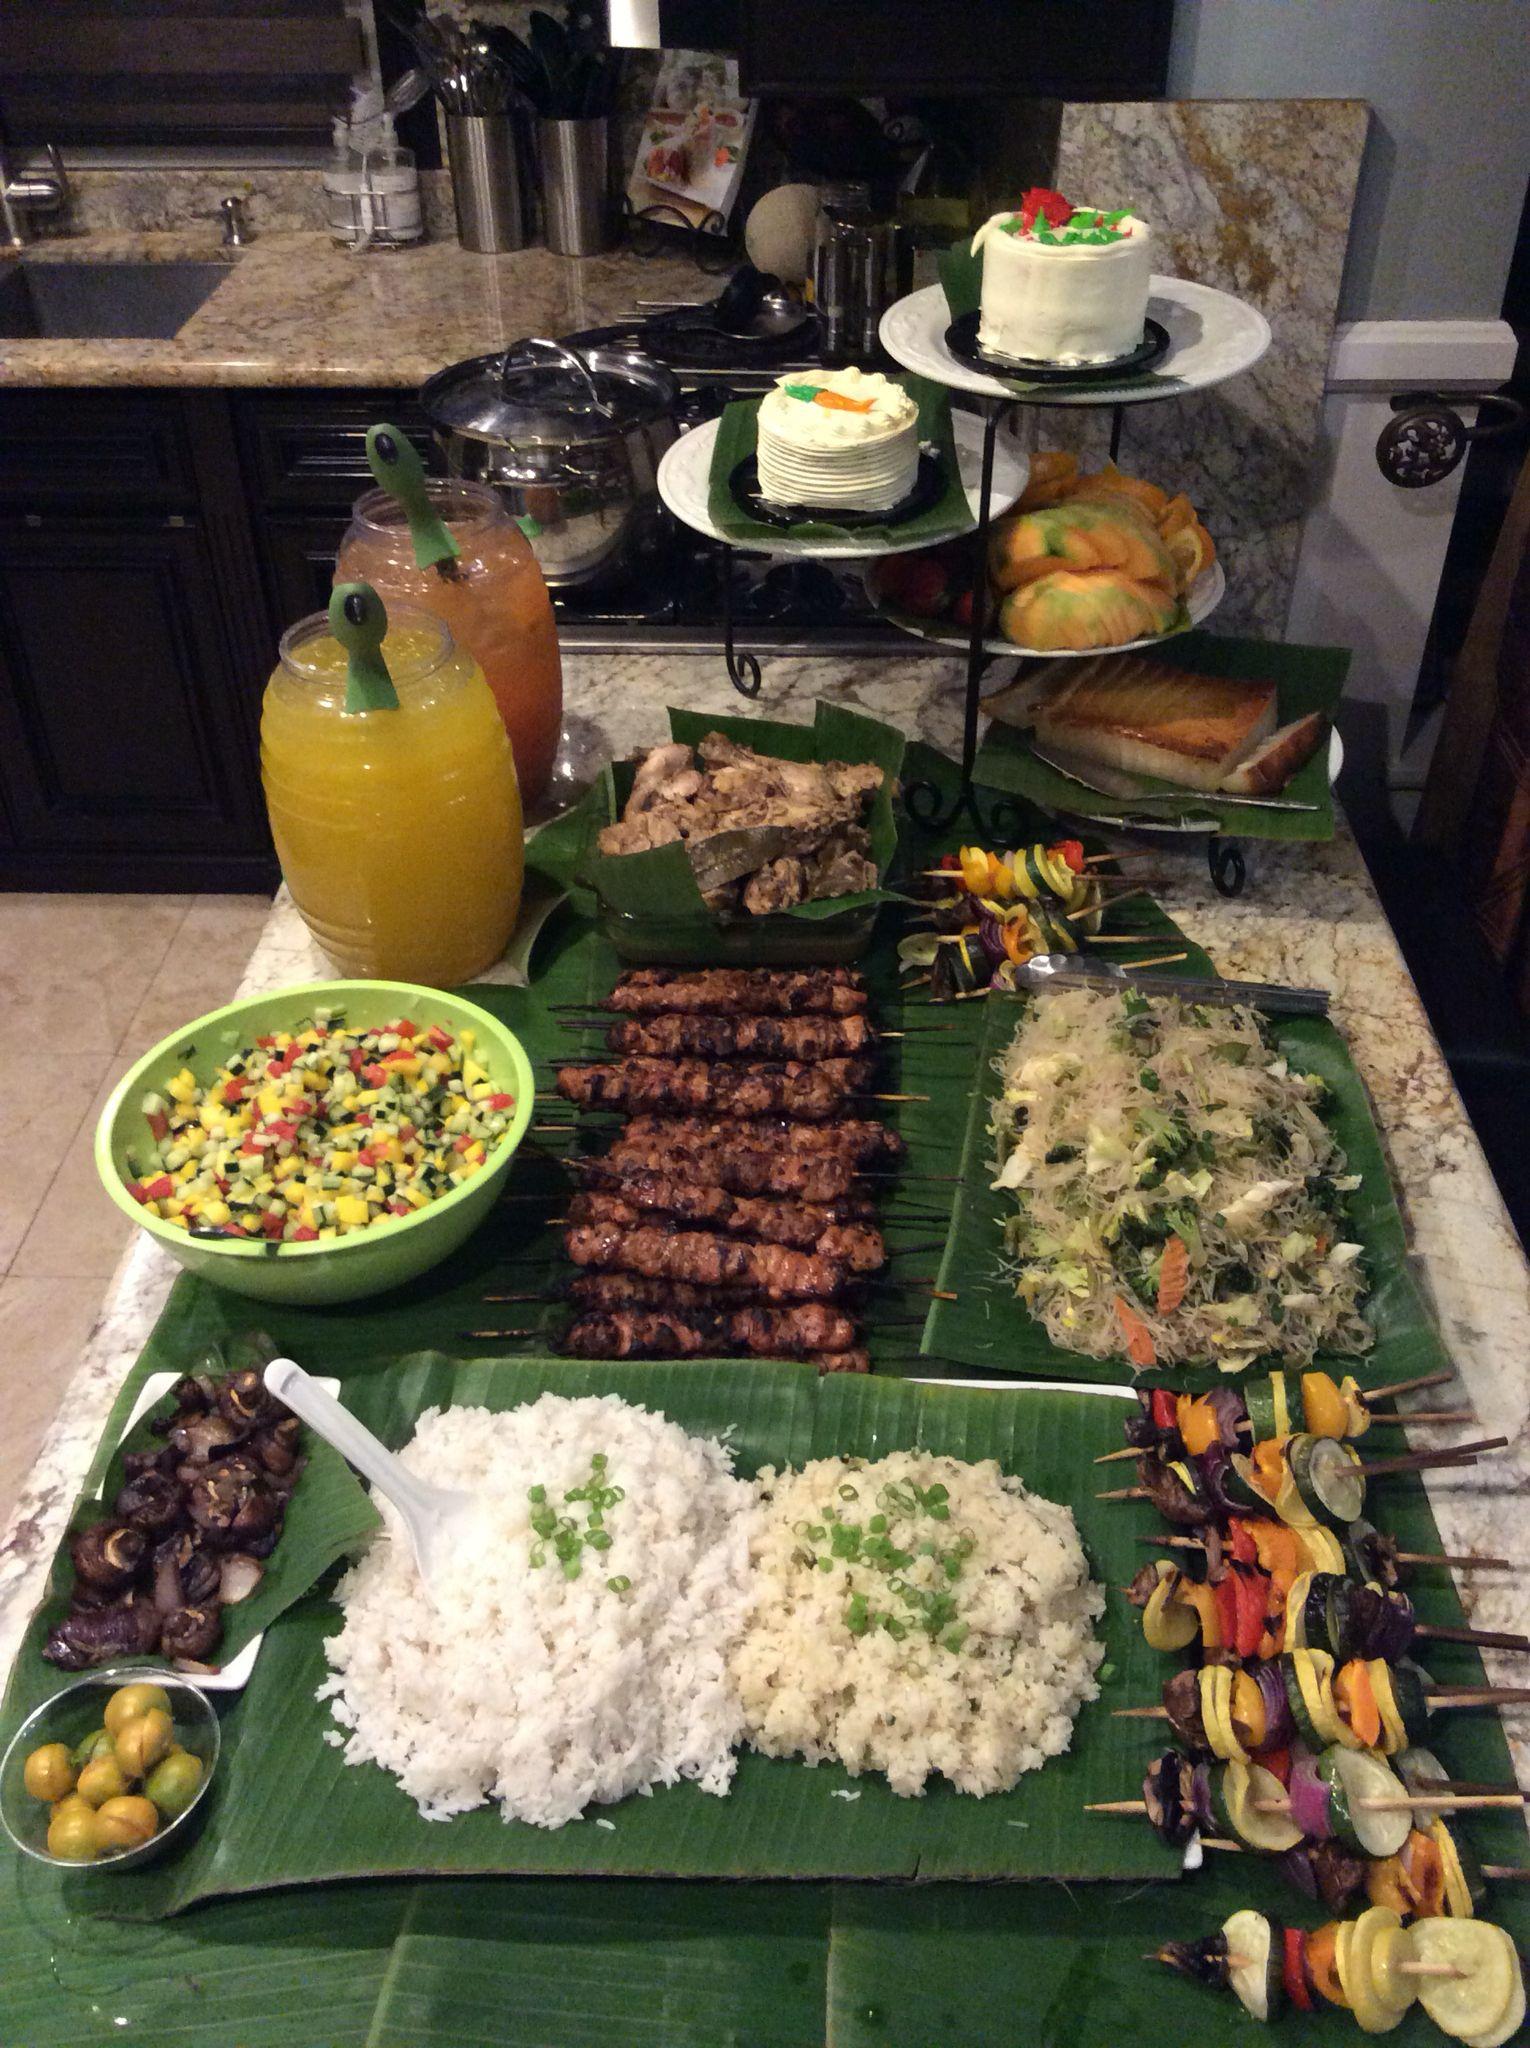 Filipino table setting - Cristina Richie S Chartreuse Green Wedding Catholic Wedding Green Weddings And Paper Source